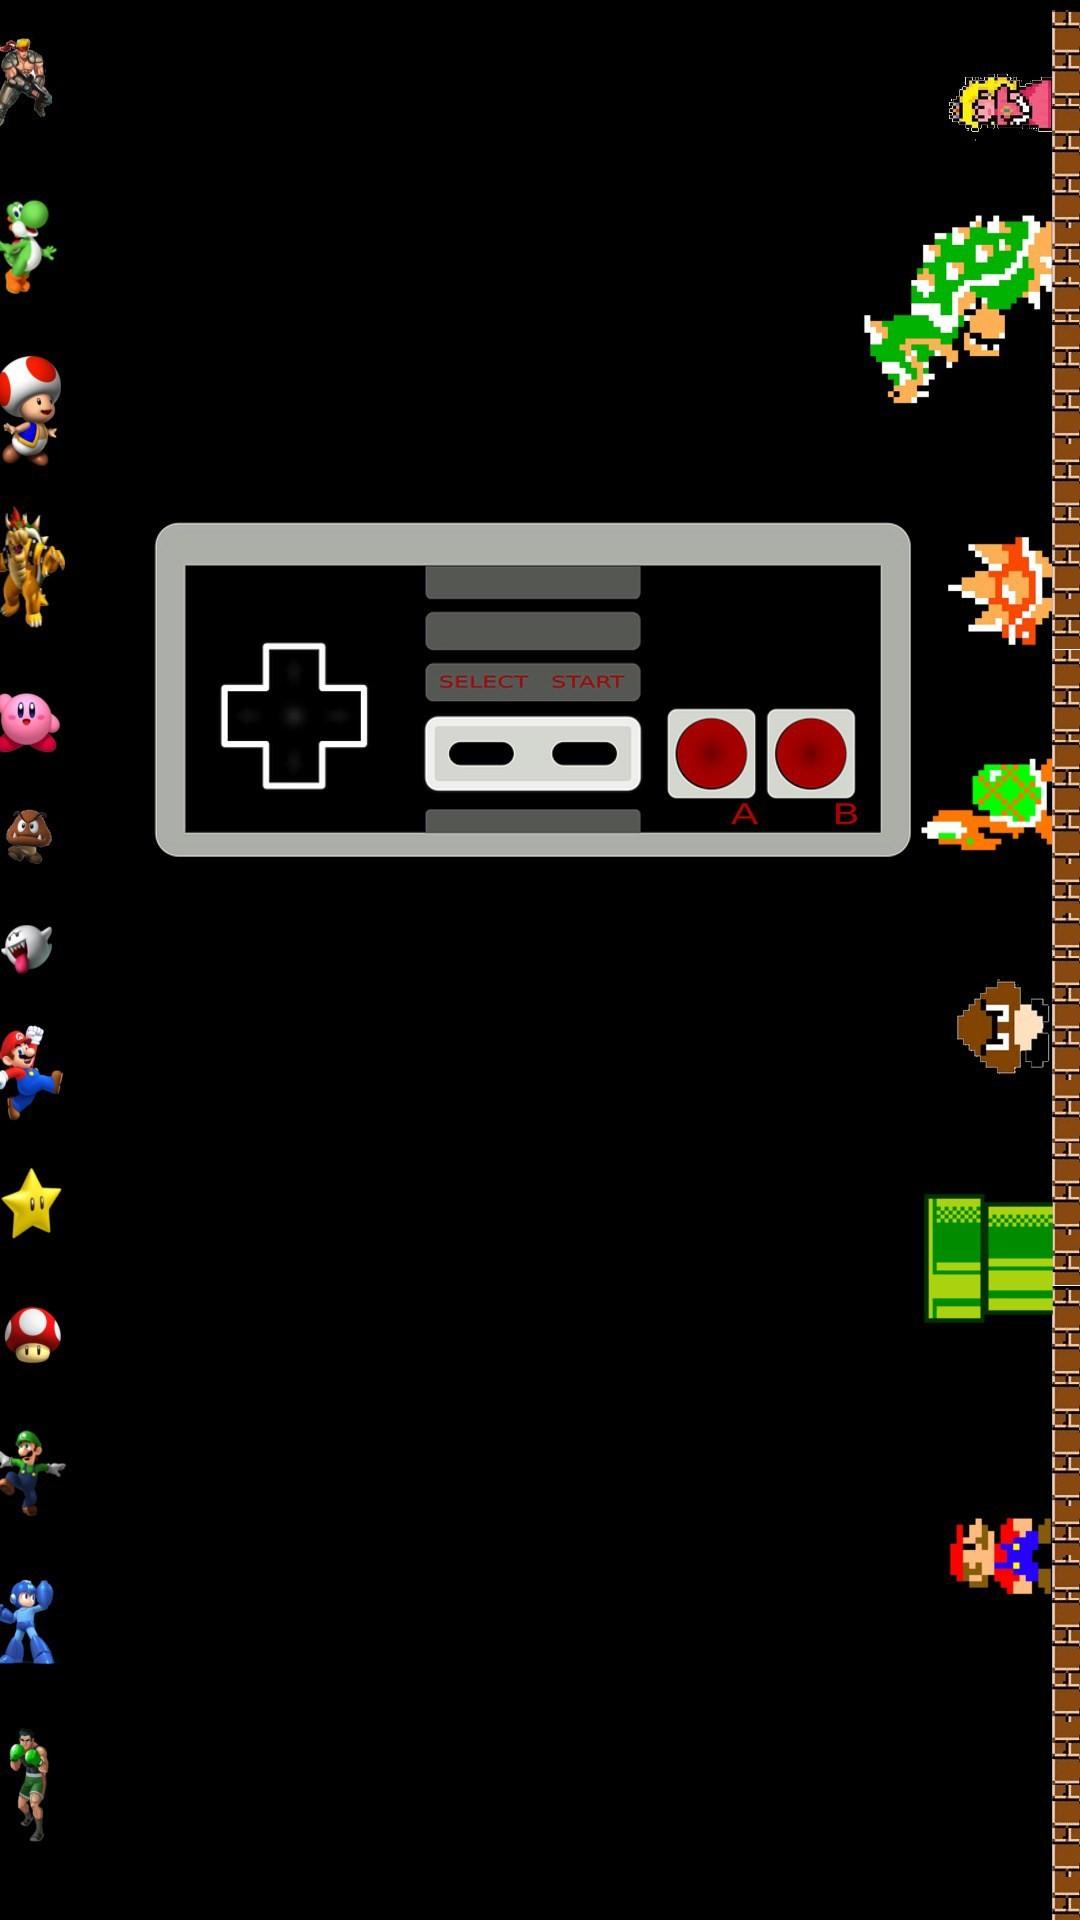 Nintendo NES Classic iPhone Wallpaper HD   Amazing HD Wallpaper   Pinterest    Nes classic and Hd wallpaper